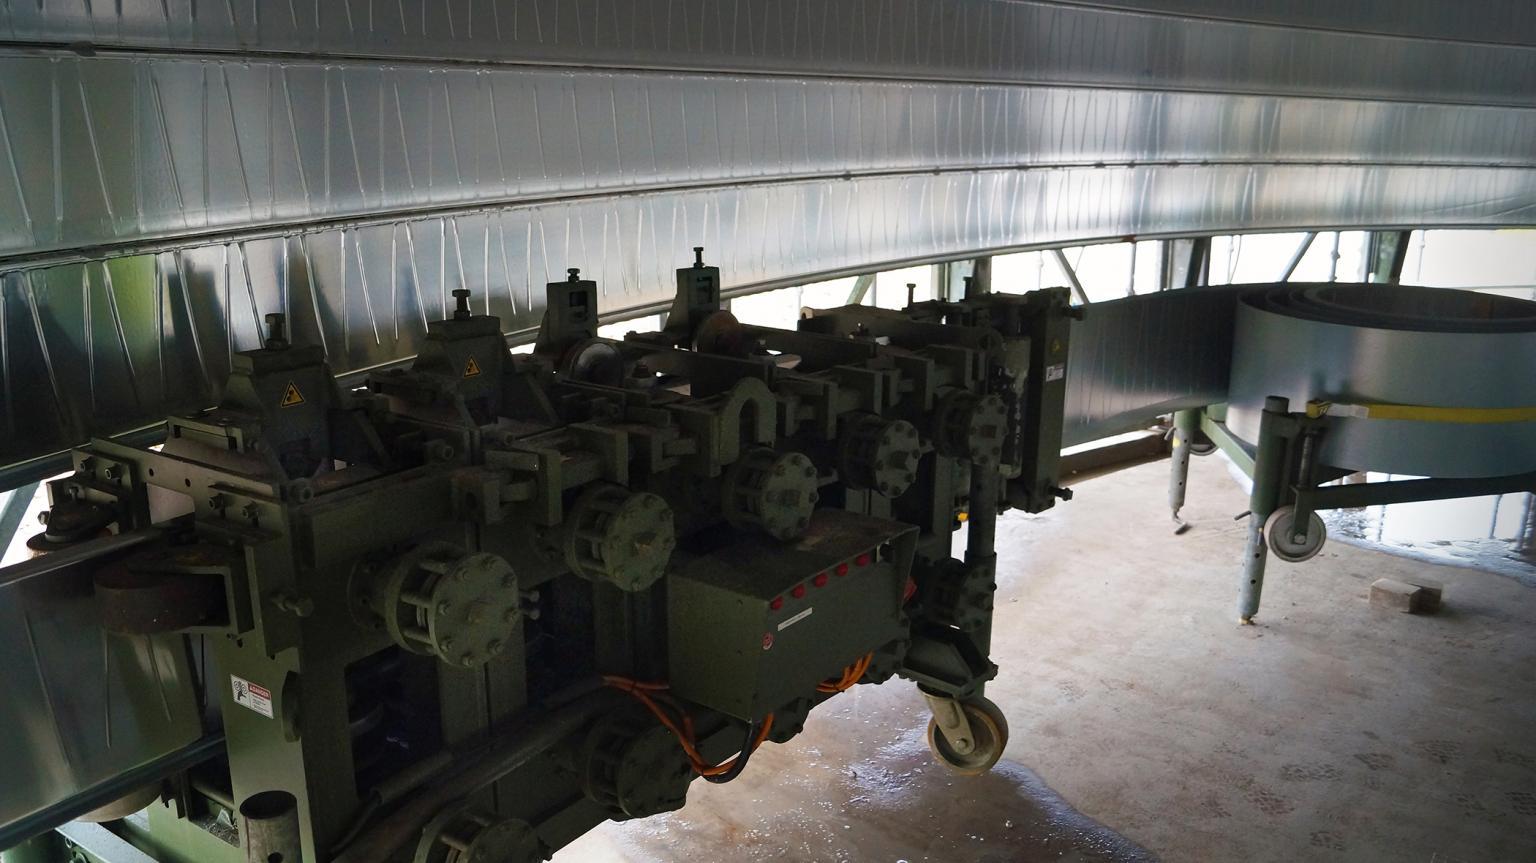 Lipp automated tank build equipment